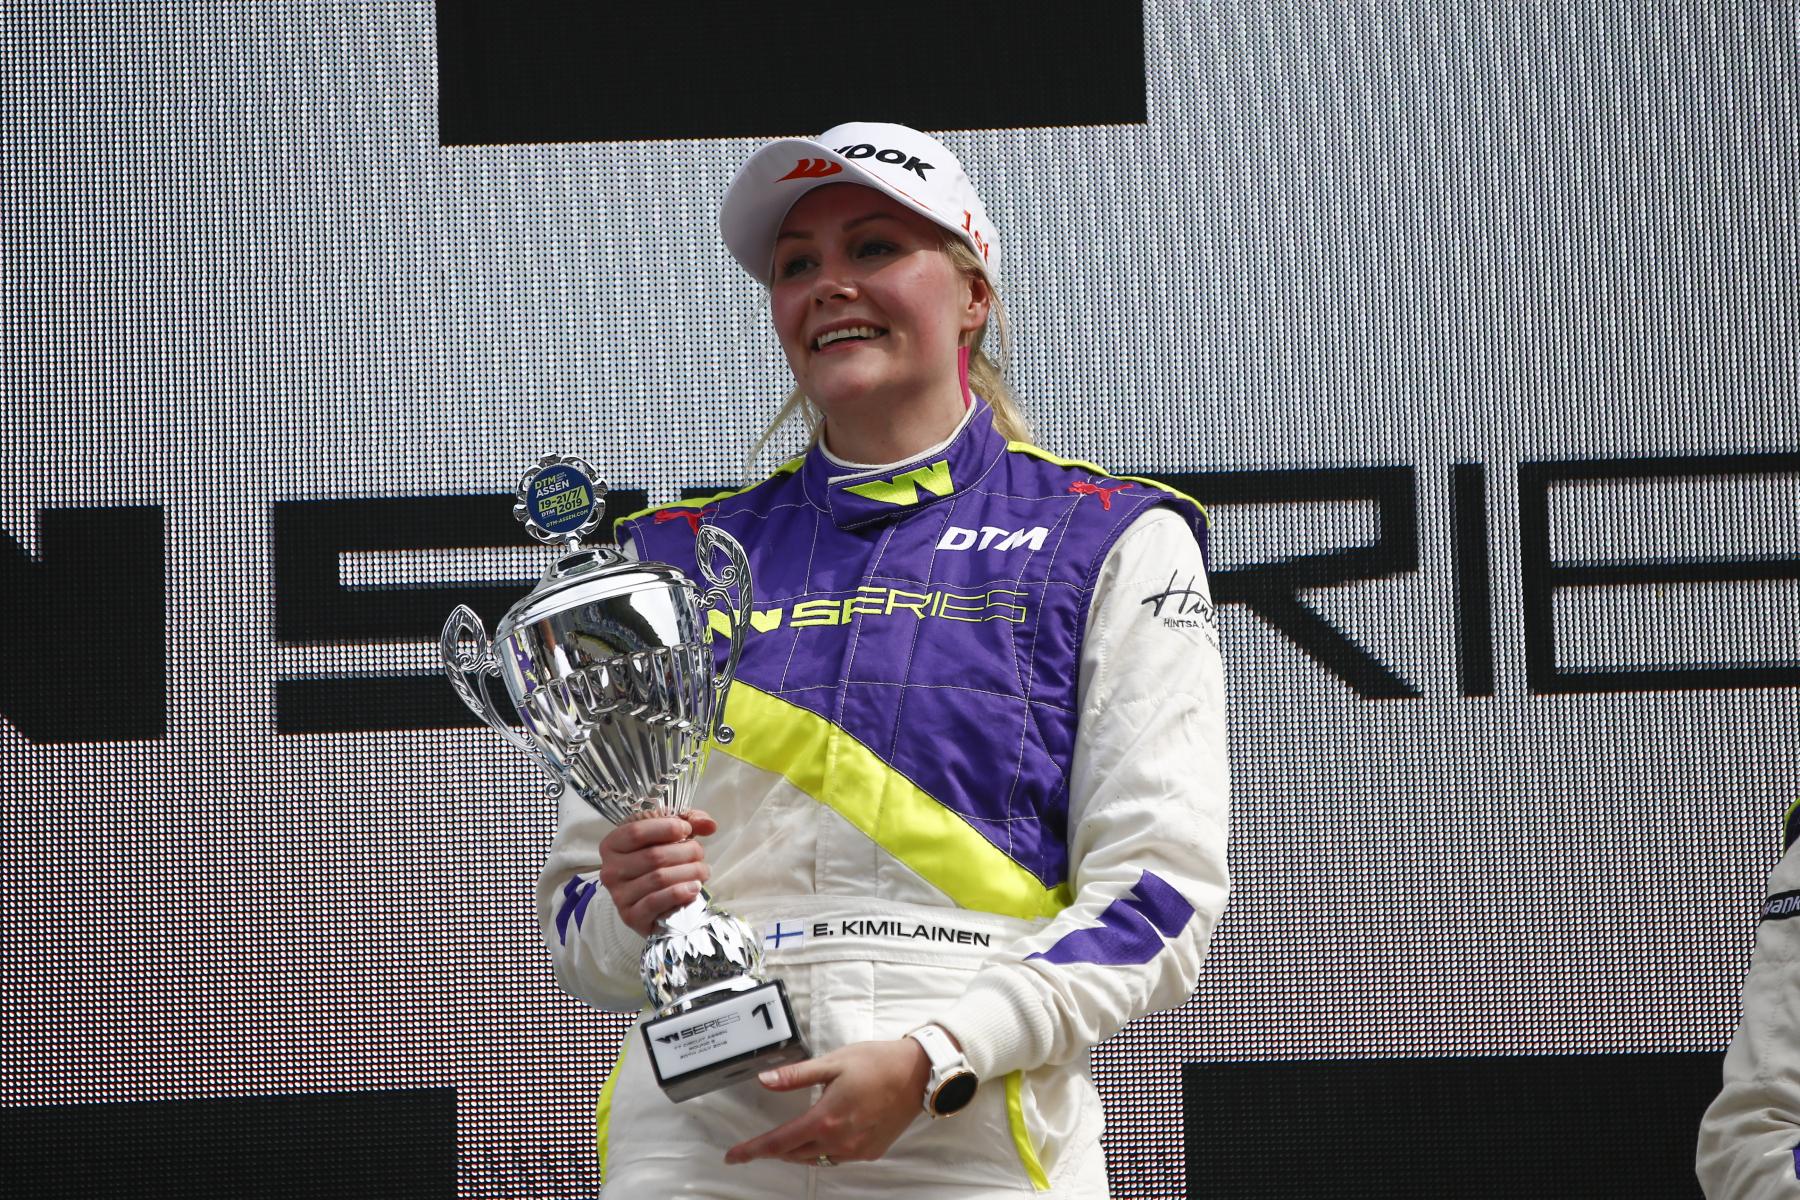 W Series Emma Kimilainen